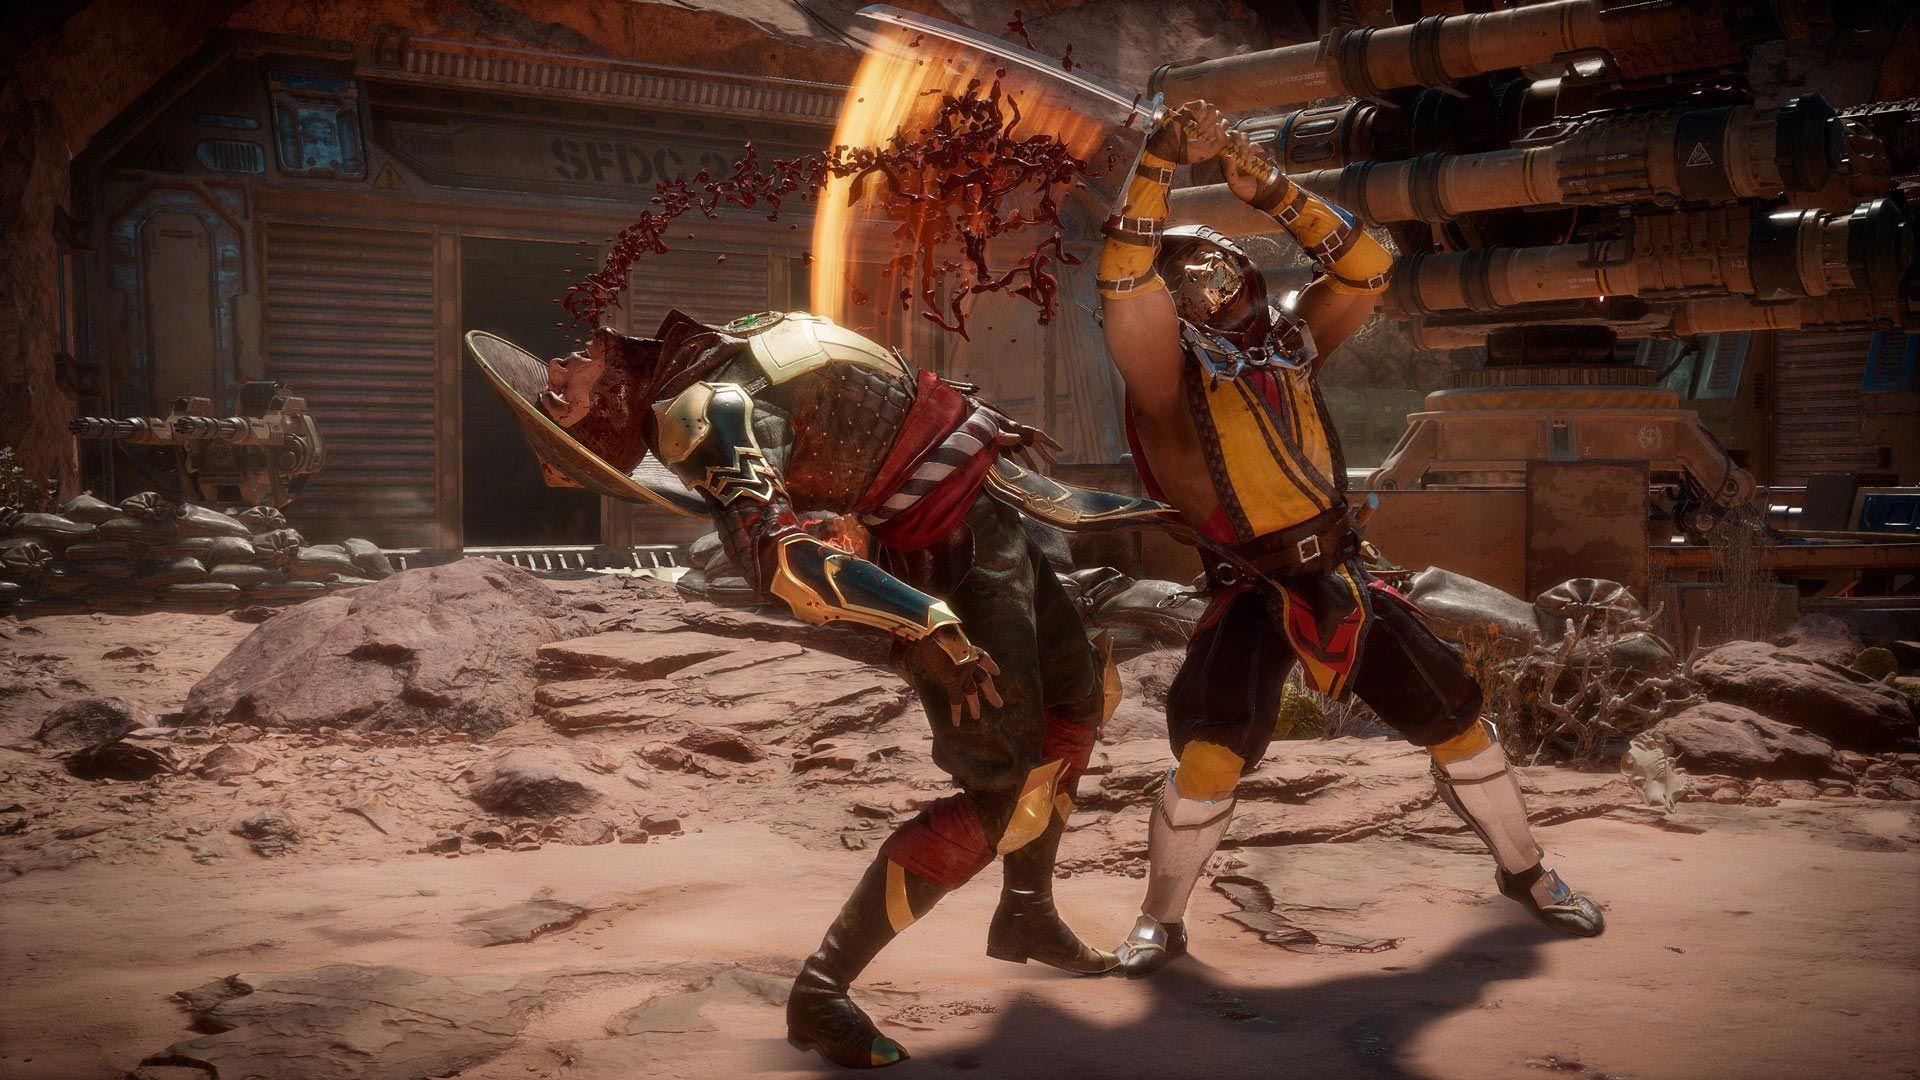 Ed Boon Says Rendering Mortal Kombat 11's Slow Motion